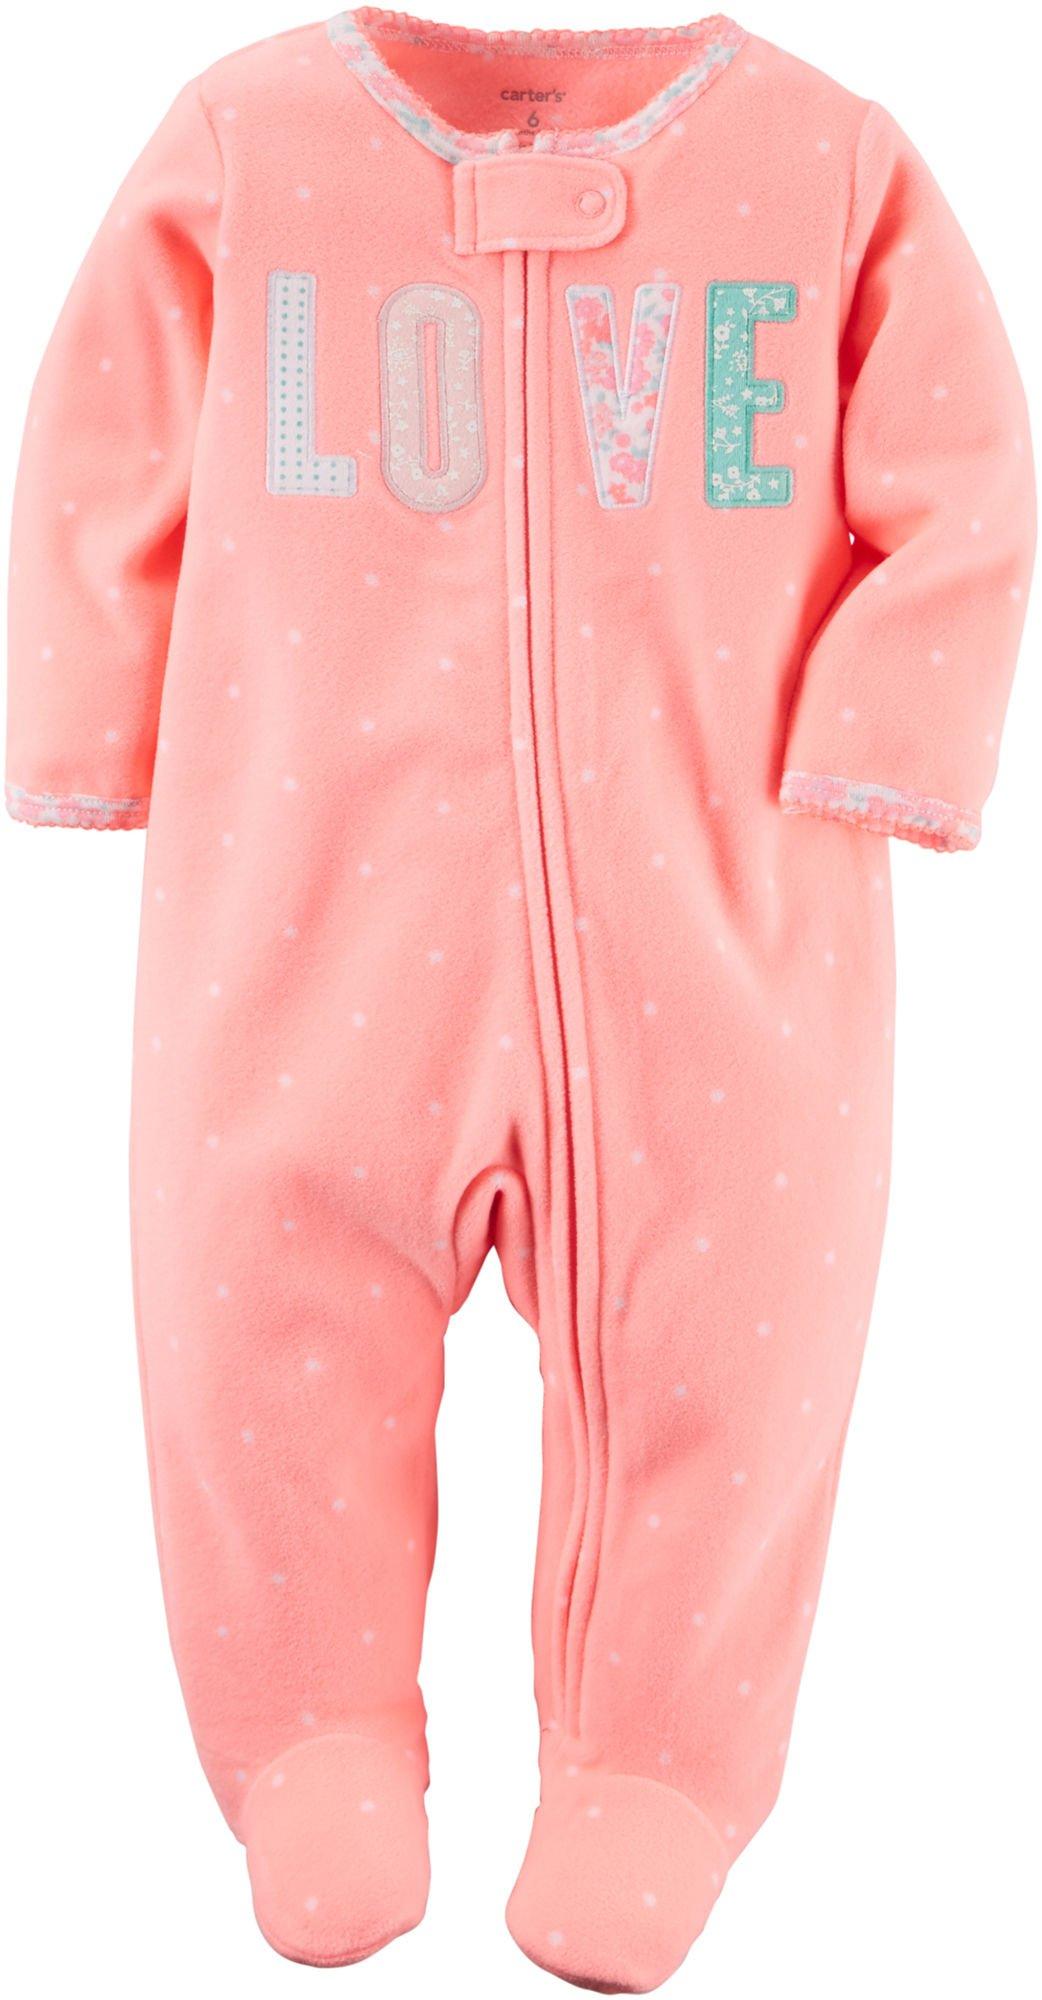 Carter's Baby Girls' Microfleece 115g148, Coral, 6